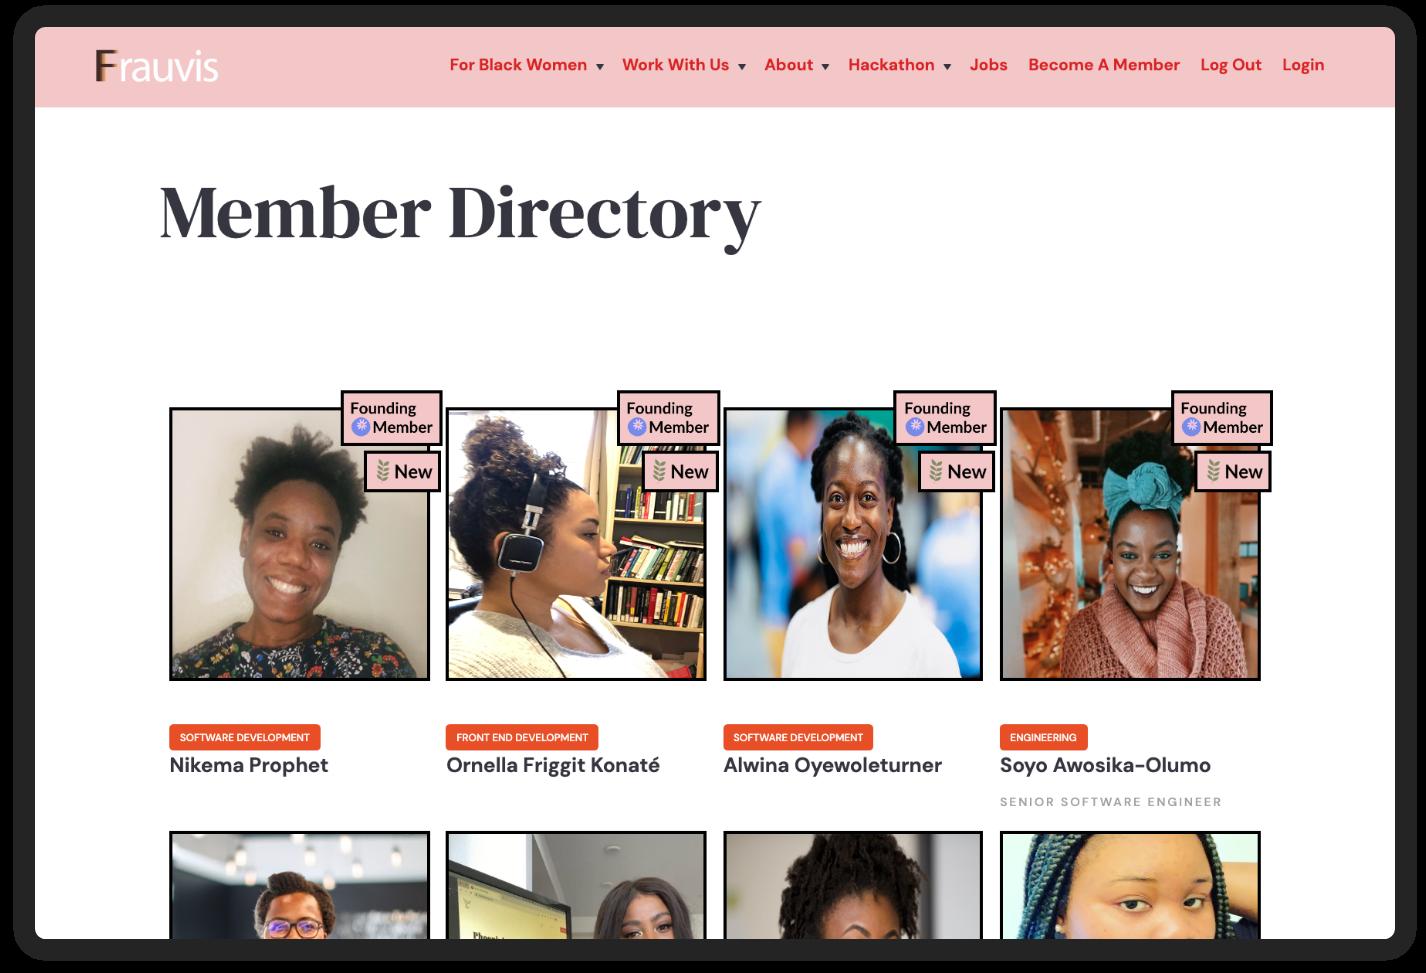 Frauvis members directory.